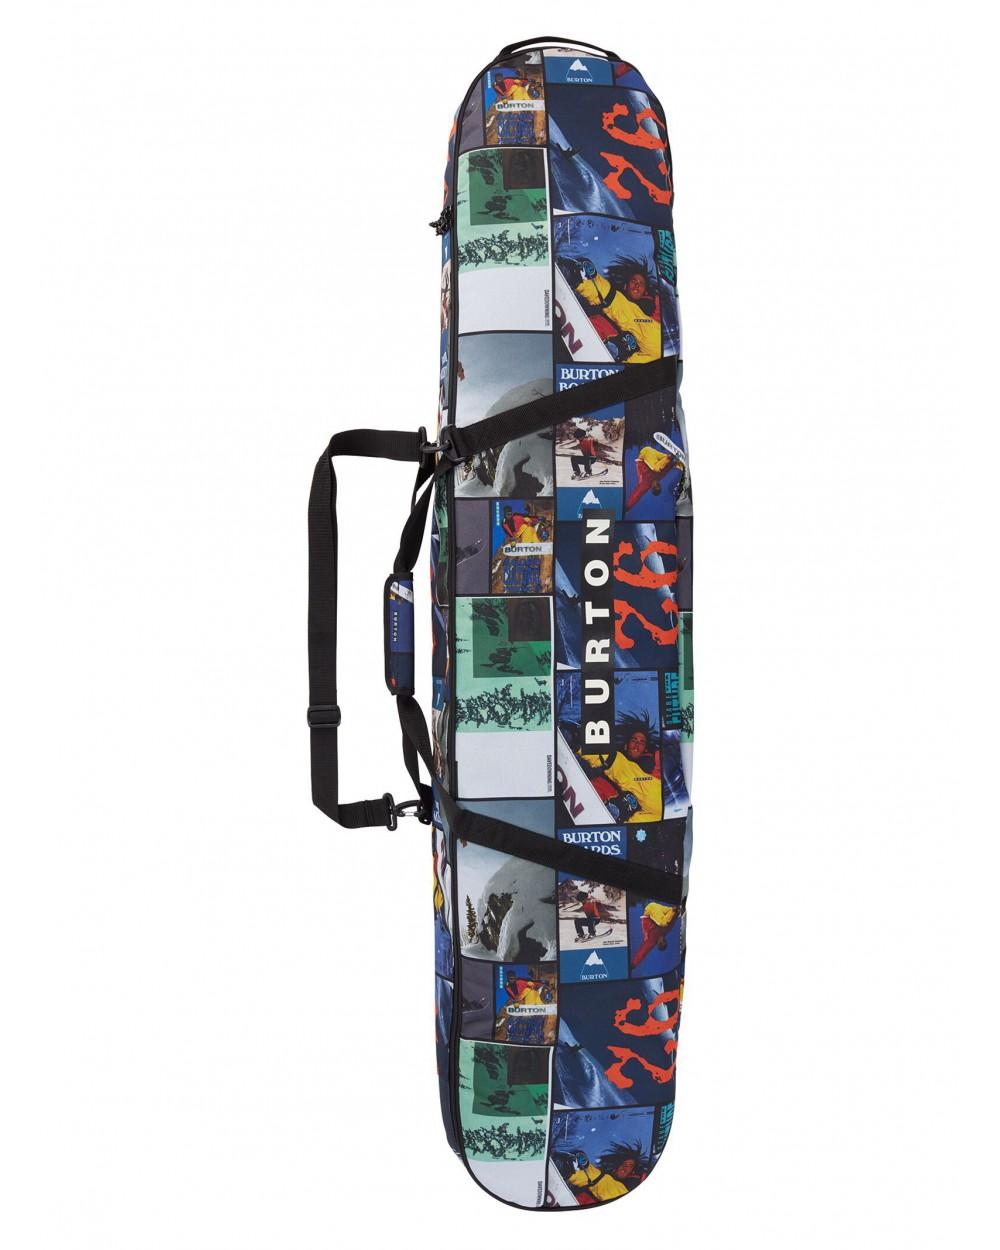 Burton Space Sack Board Bag 146 - Catalog Collage Print